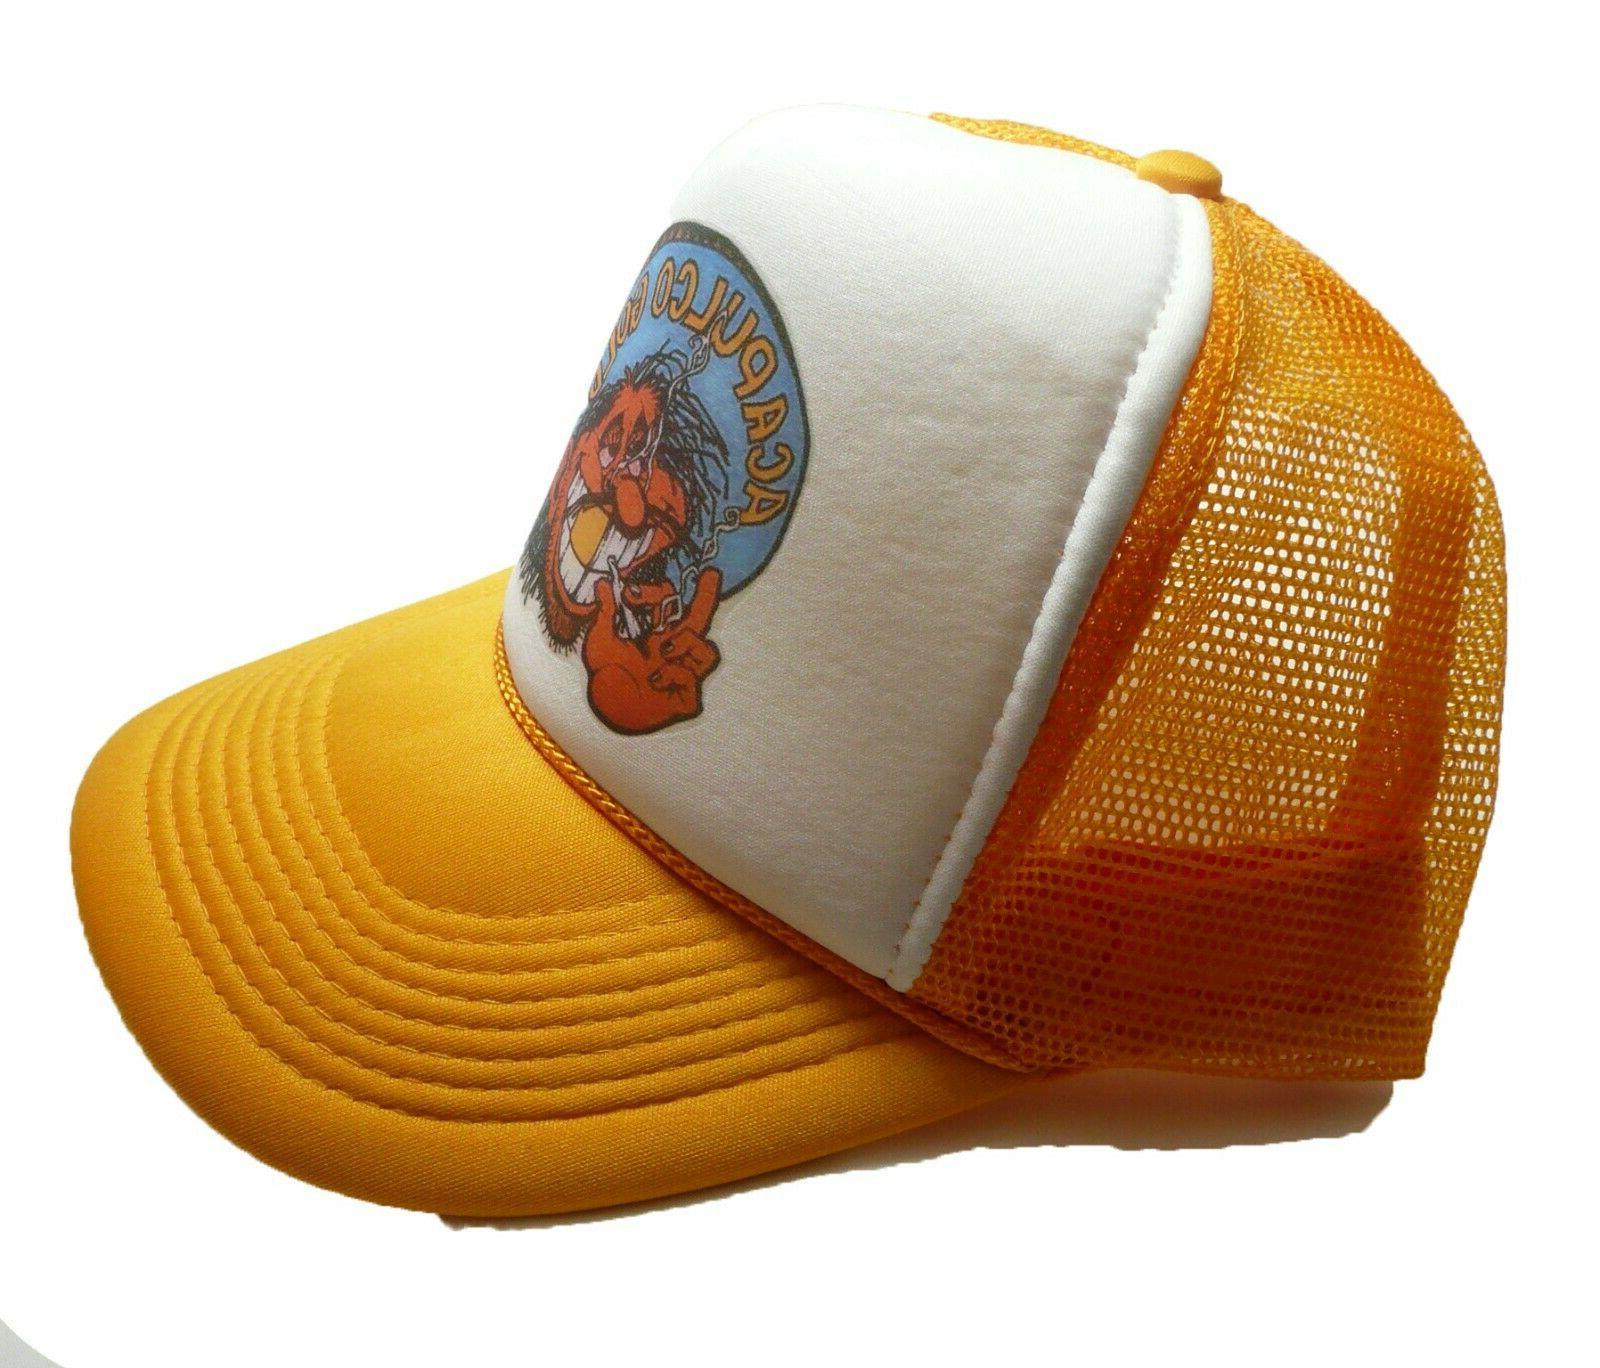 Vintage Acapulco hat trucker cap Snap back yellow new